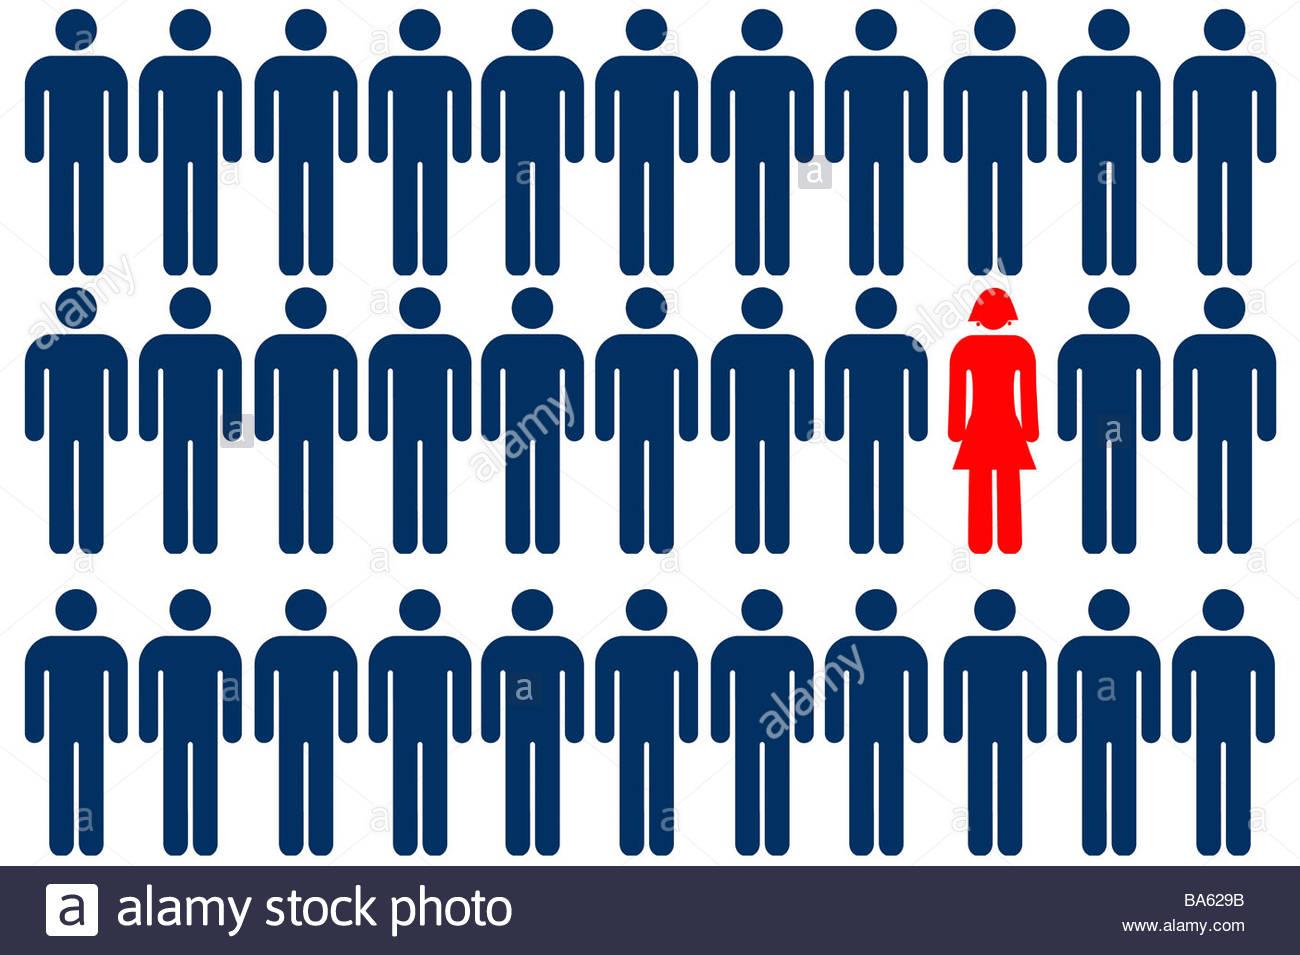 Unique female person symbol among group of male person symbols - Stock Image